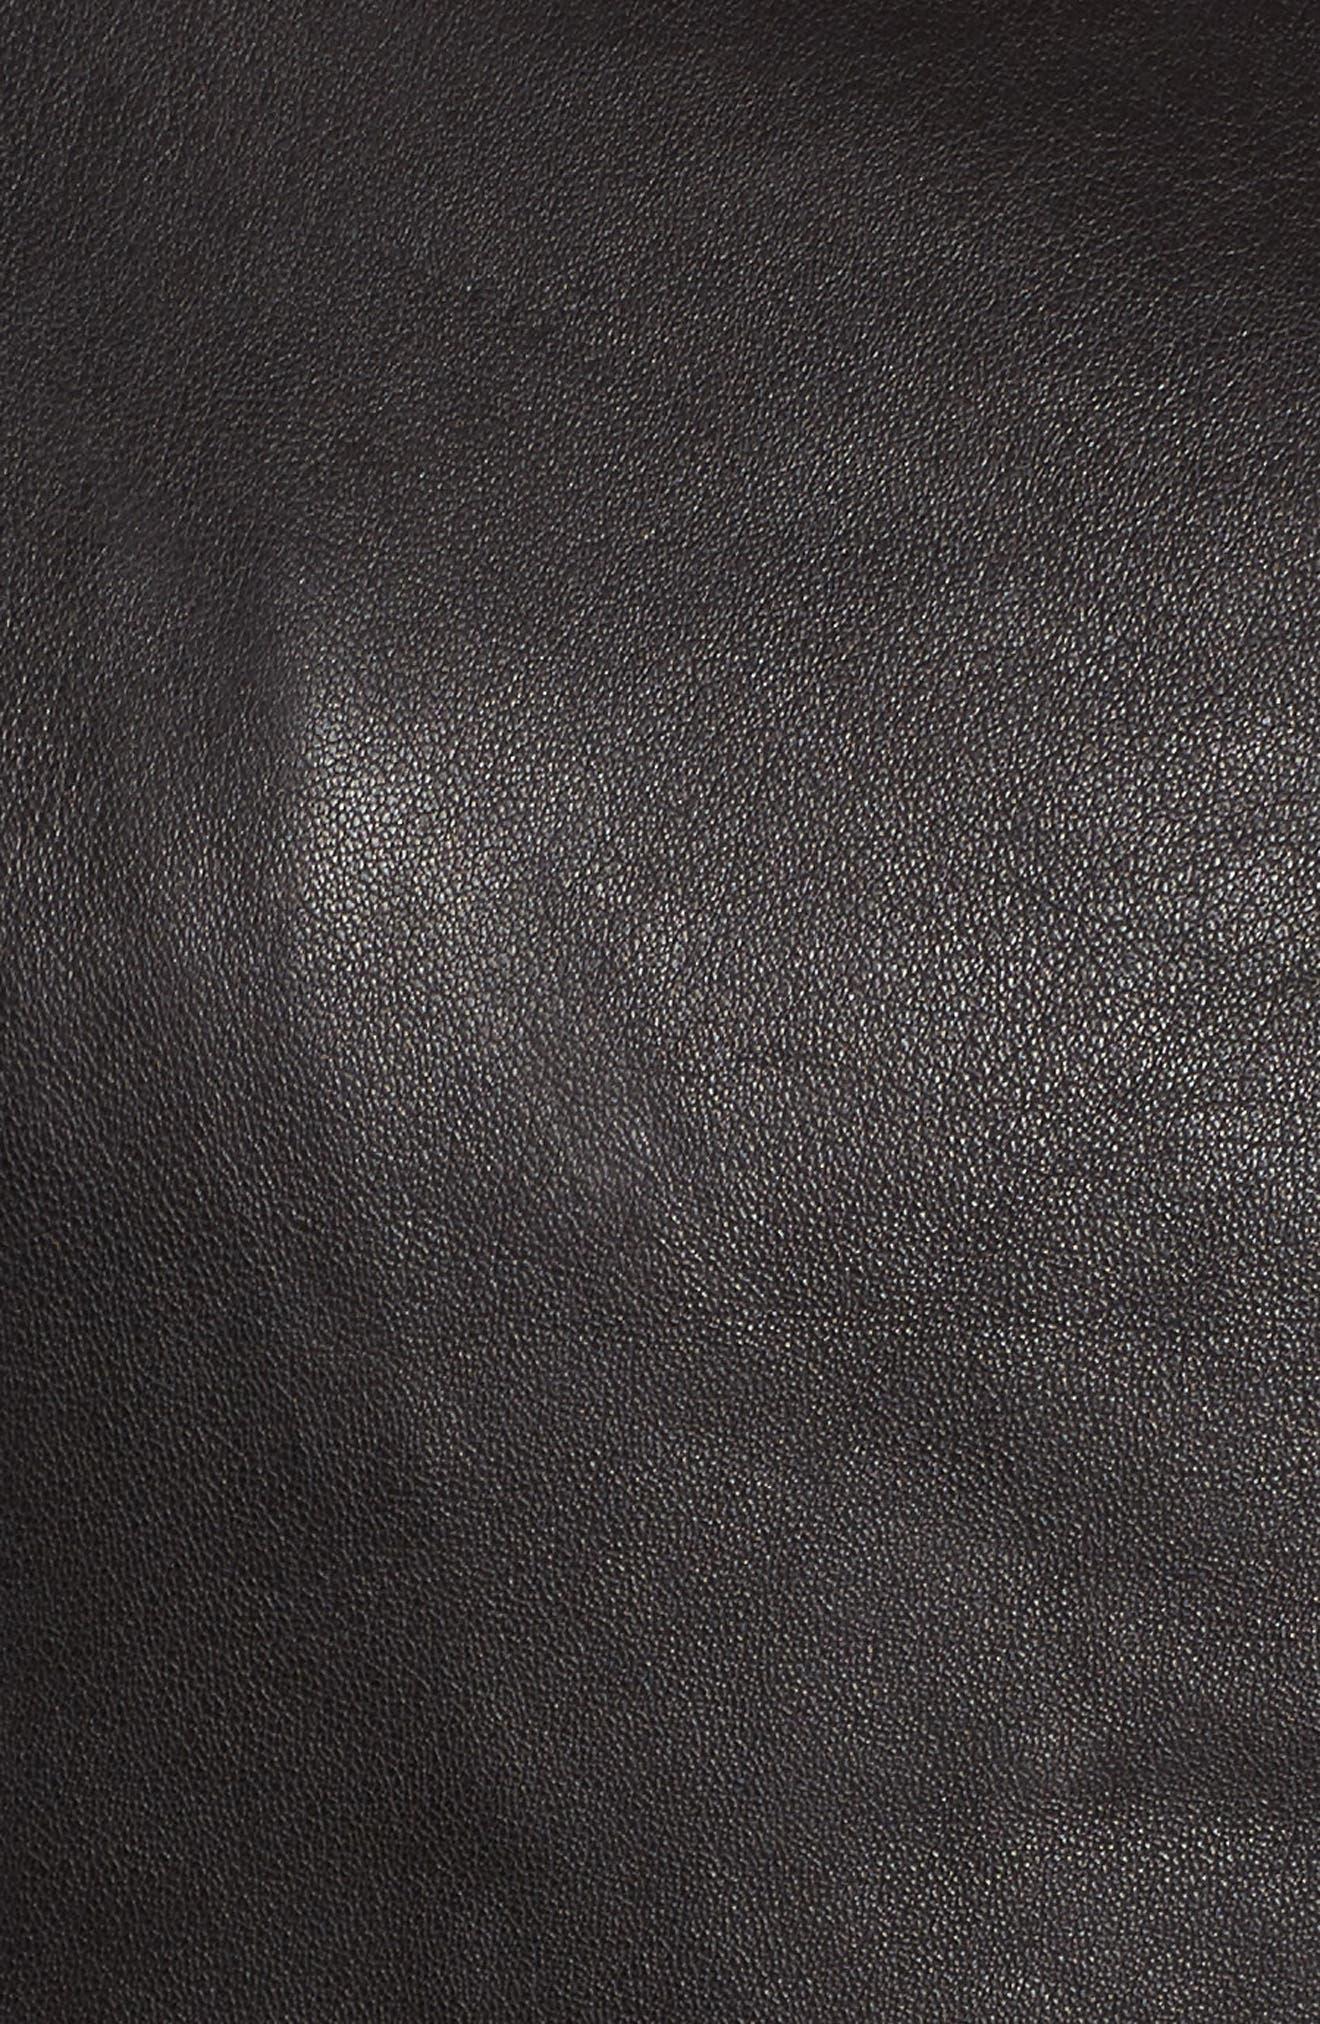 Alternate Image 5  - BB Dakota Harwick Leather Moto Jacket